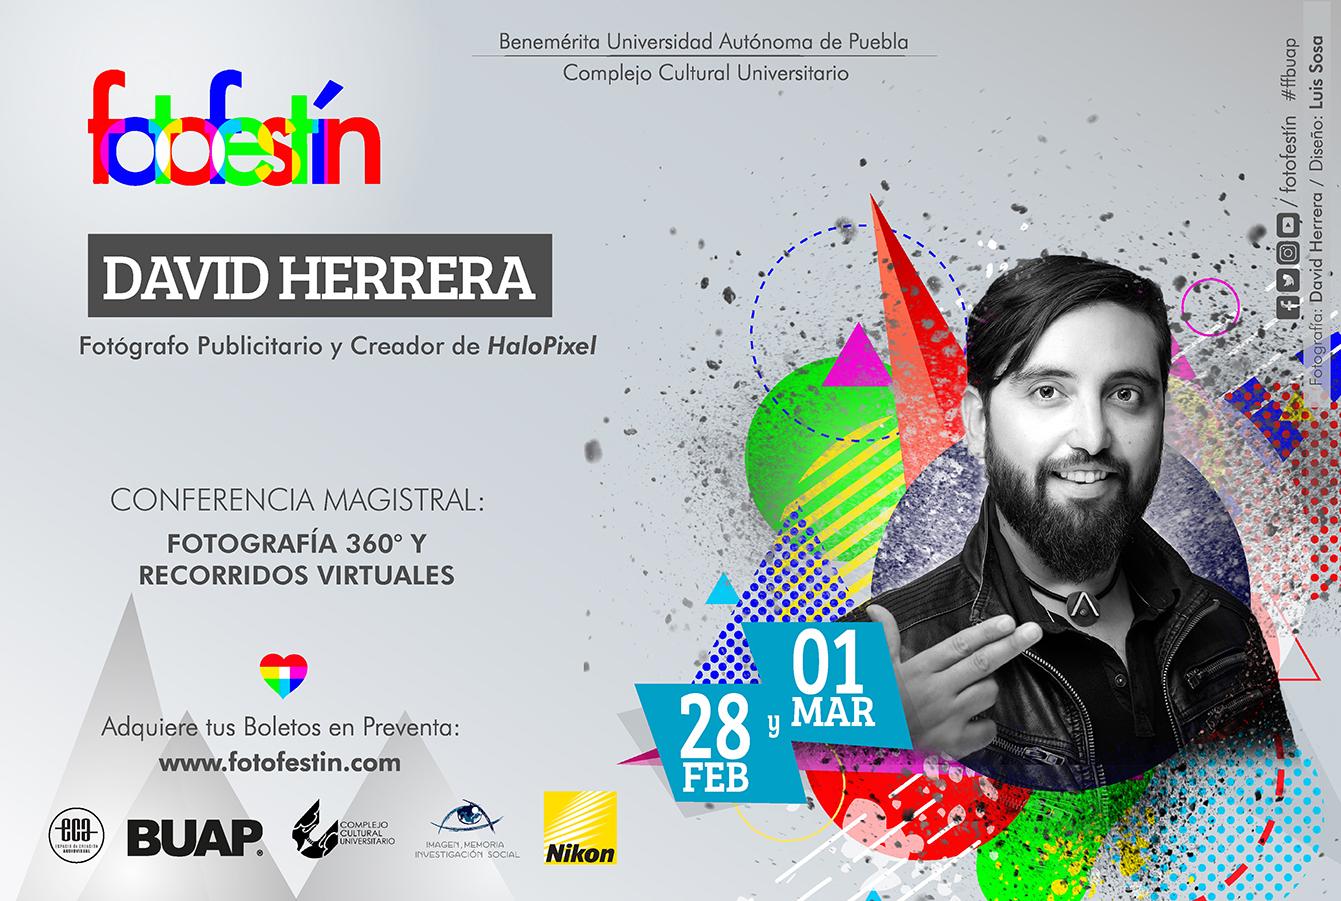 David Herrera Conferencias de fotografia fotofestin